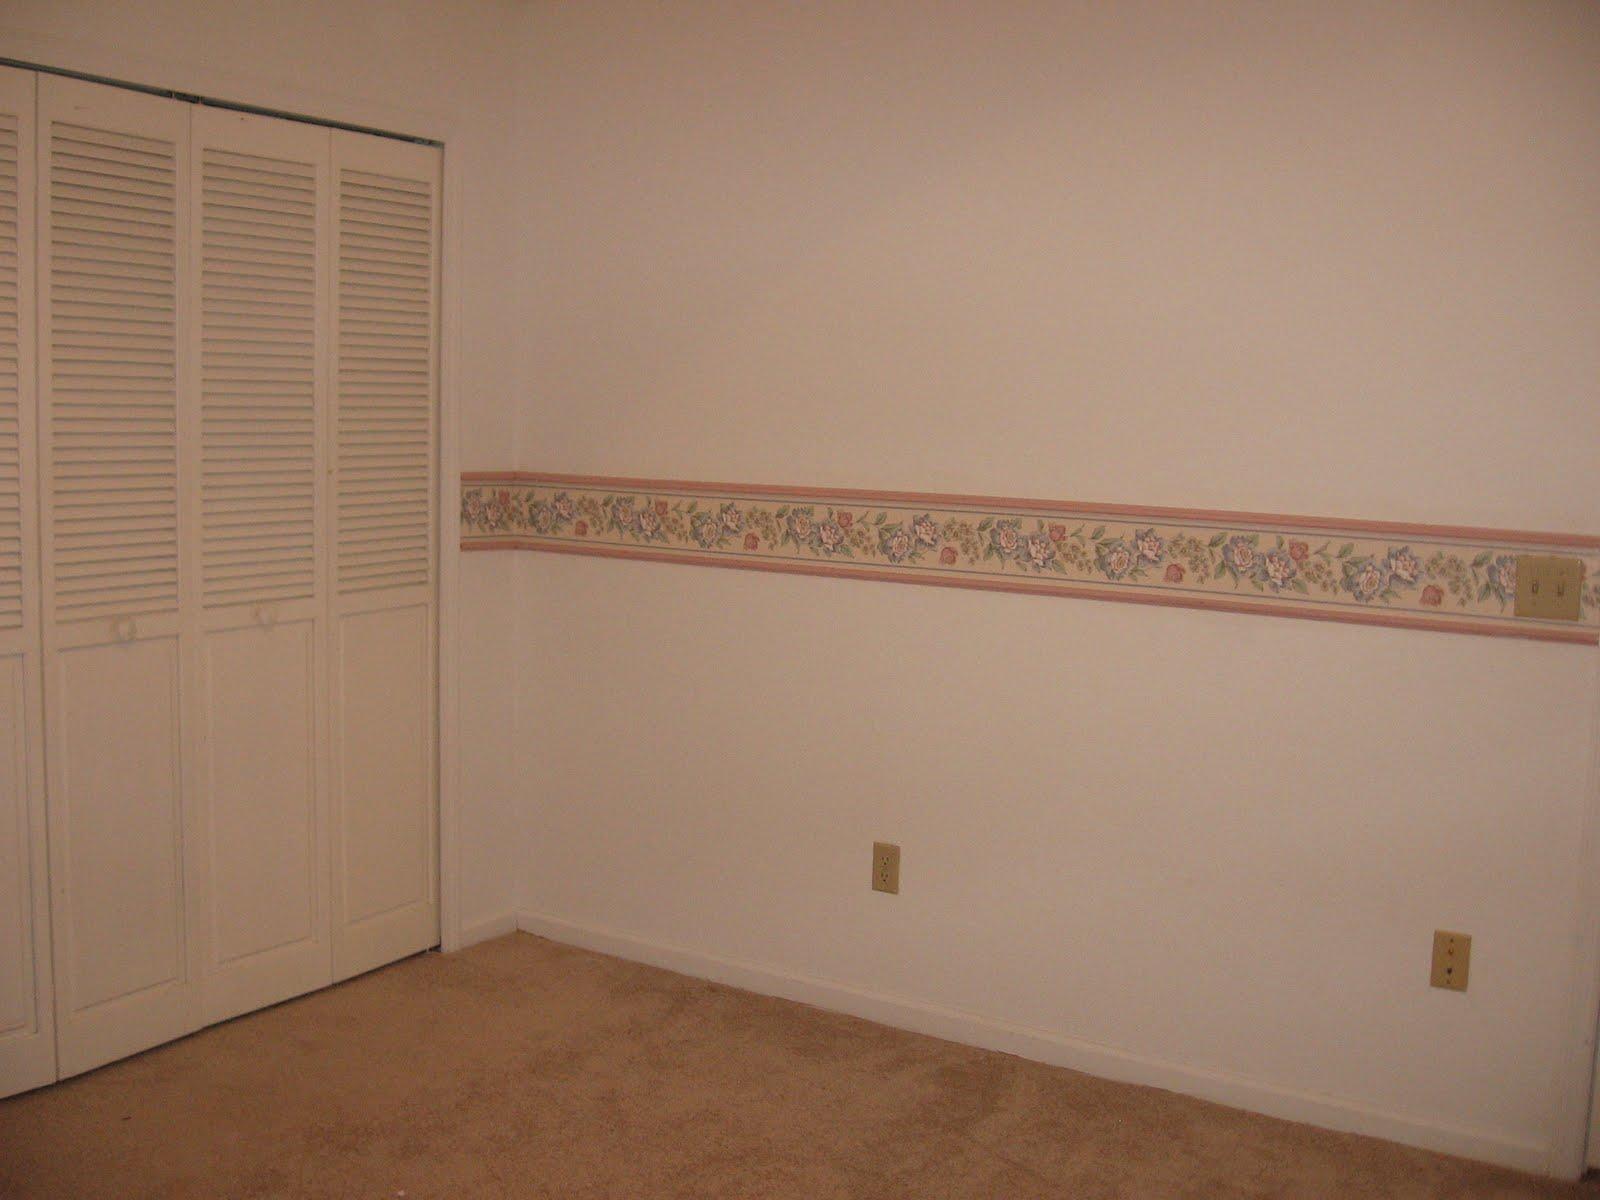 wallpaper for children cherry wood crown molding wallpaper border 1600x1200